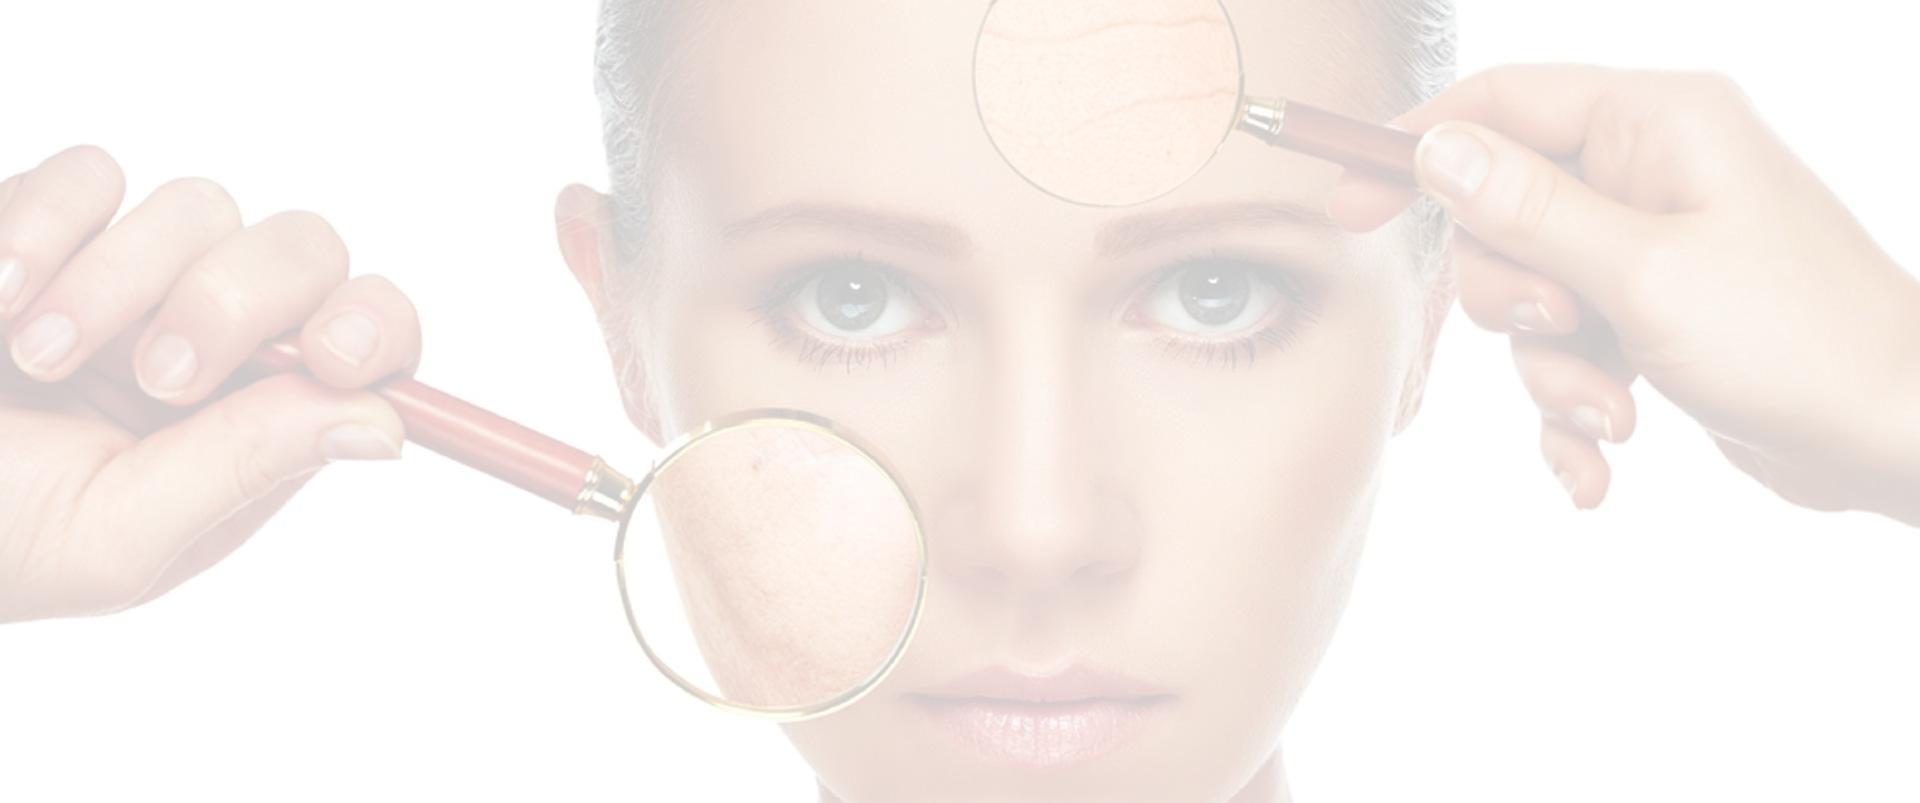 ambulatorio-dermatologia-padova-treviso